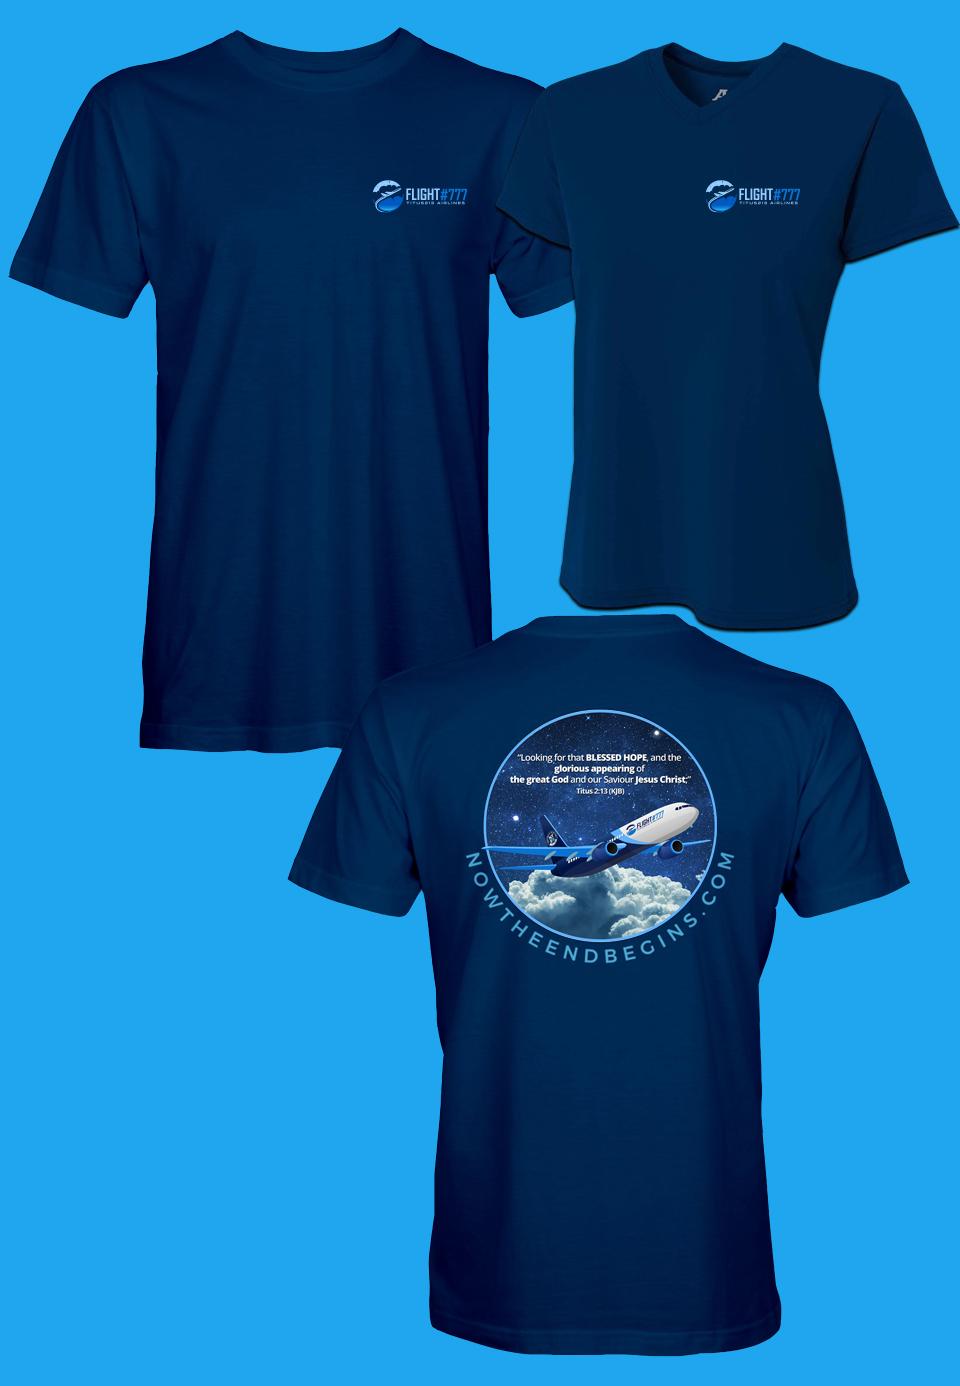 flight-777-tshirt-titus213-airlines-pretribulation-rapture-church-end-times-nteb-king-james-bible